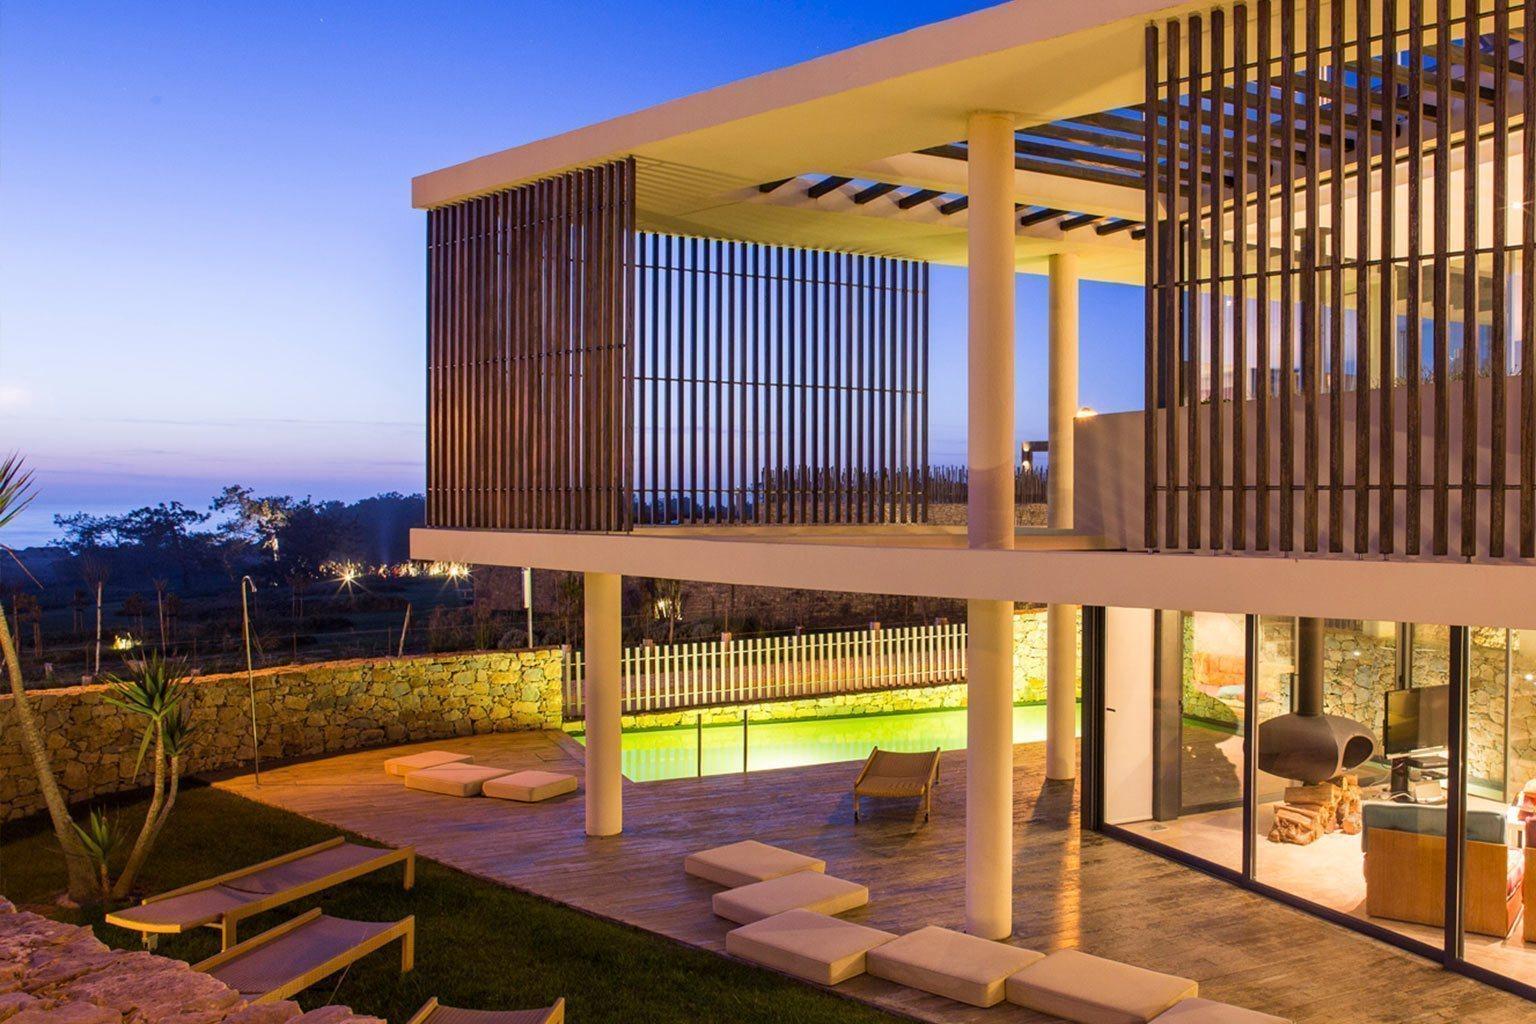 Areias do seixo in portugal luxushotels bei designreisen for Design hotel lisbona